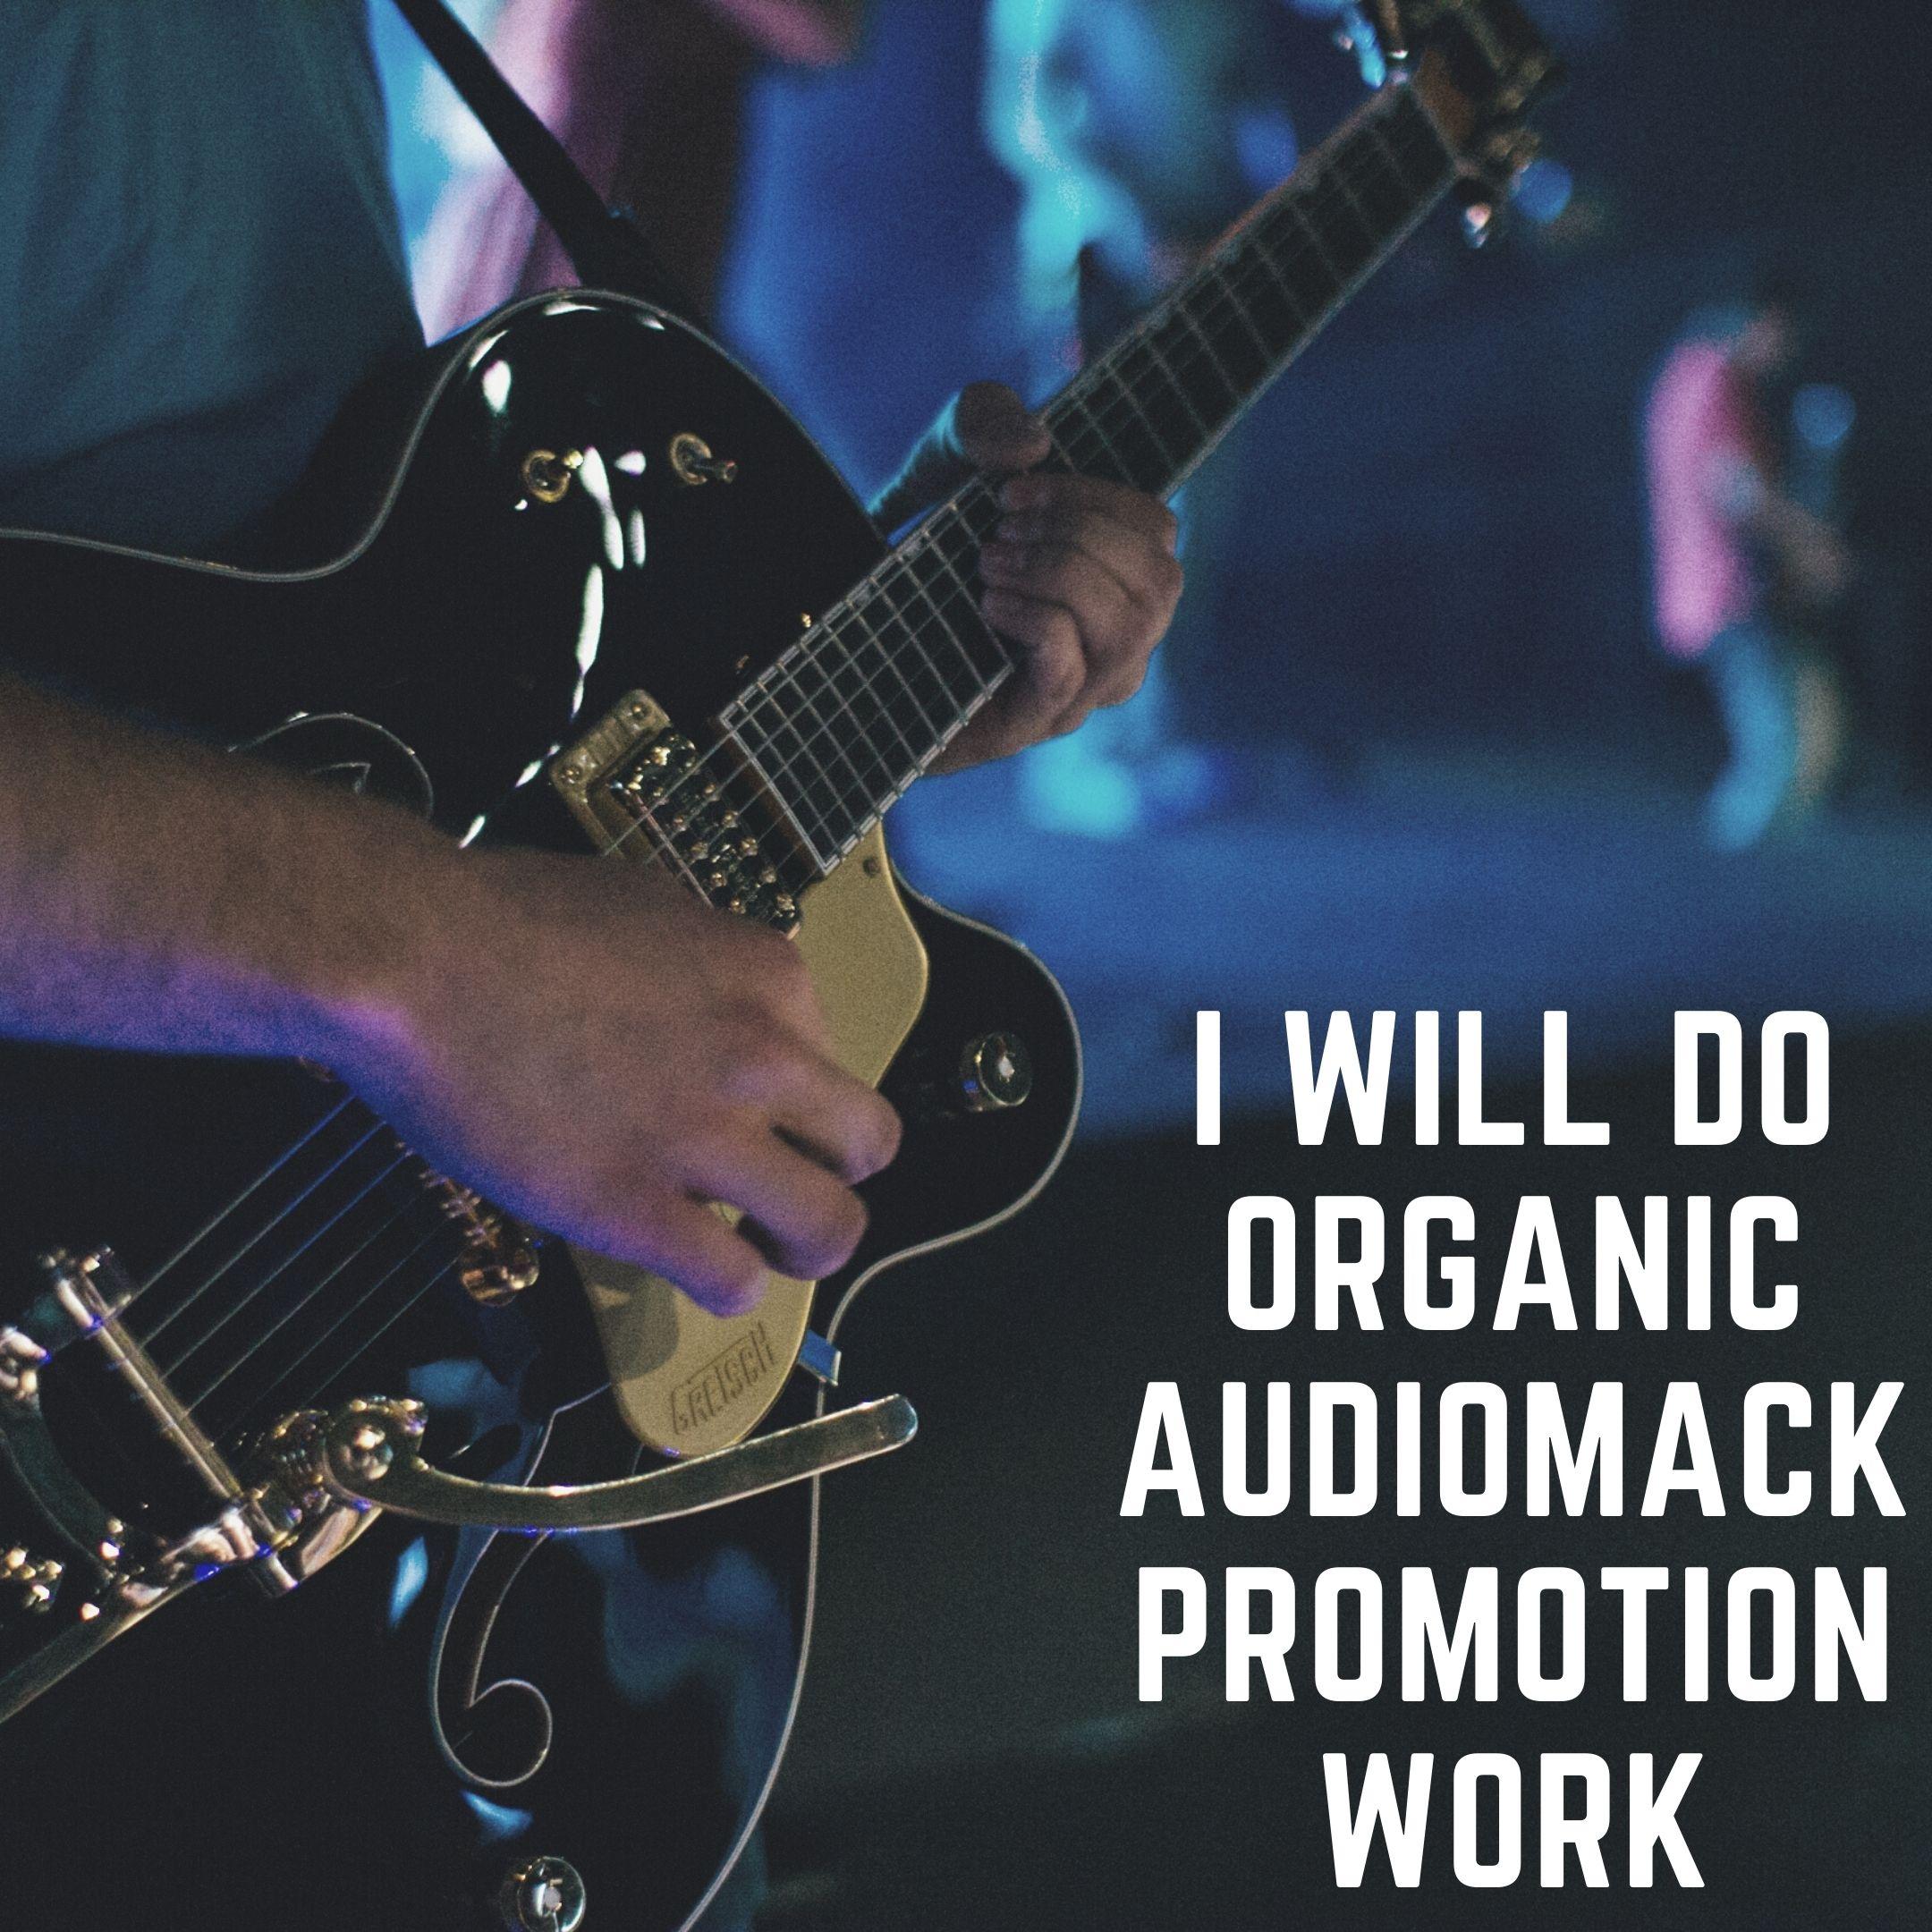 I will do organic audiomack music promotion work